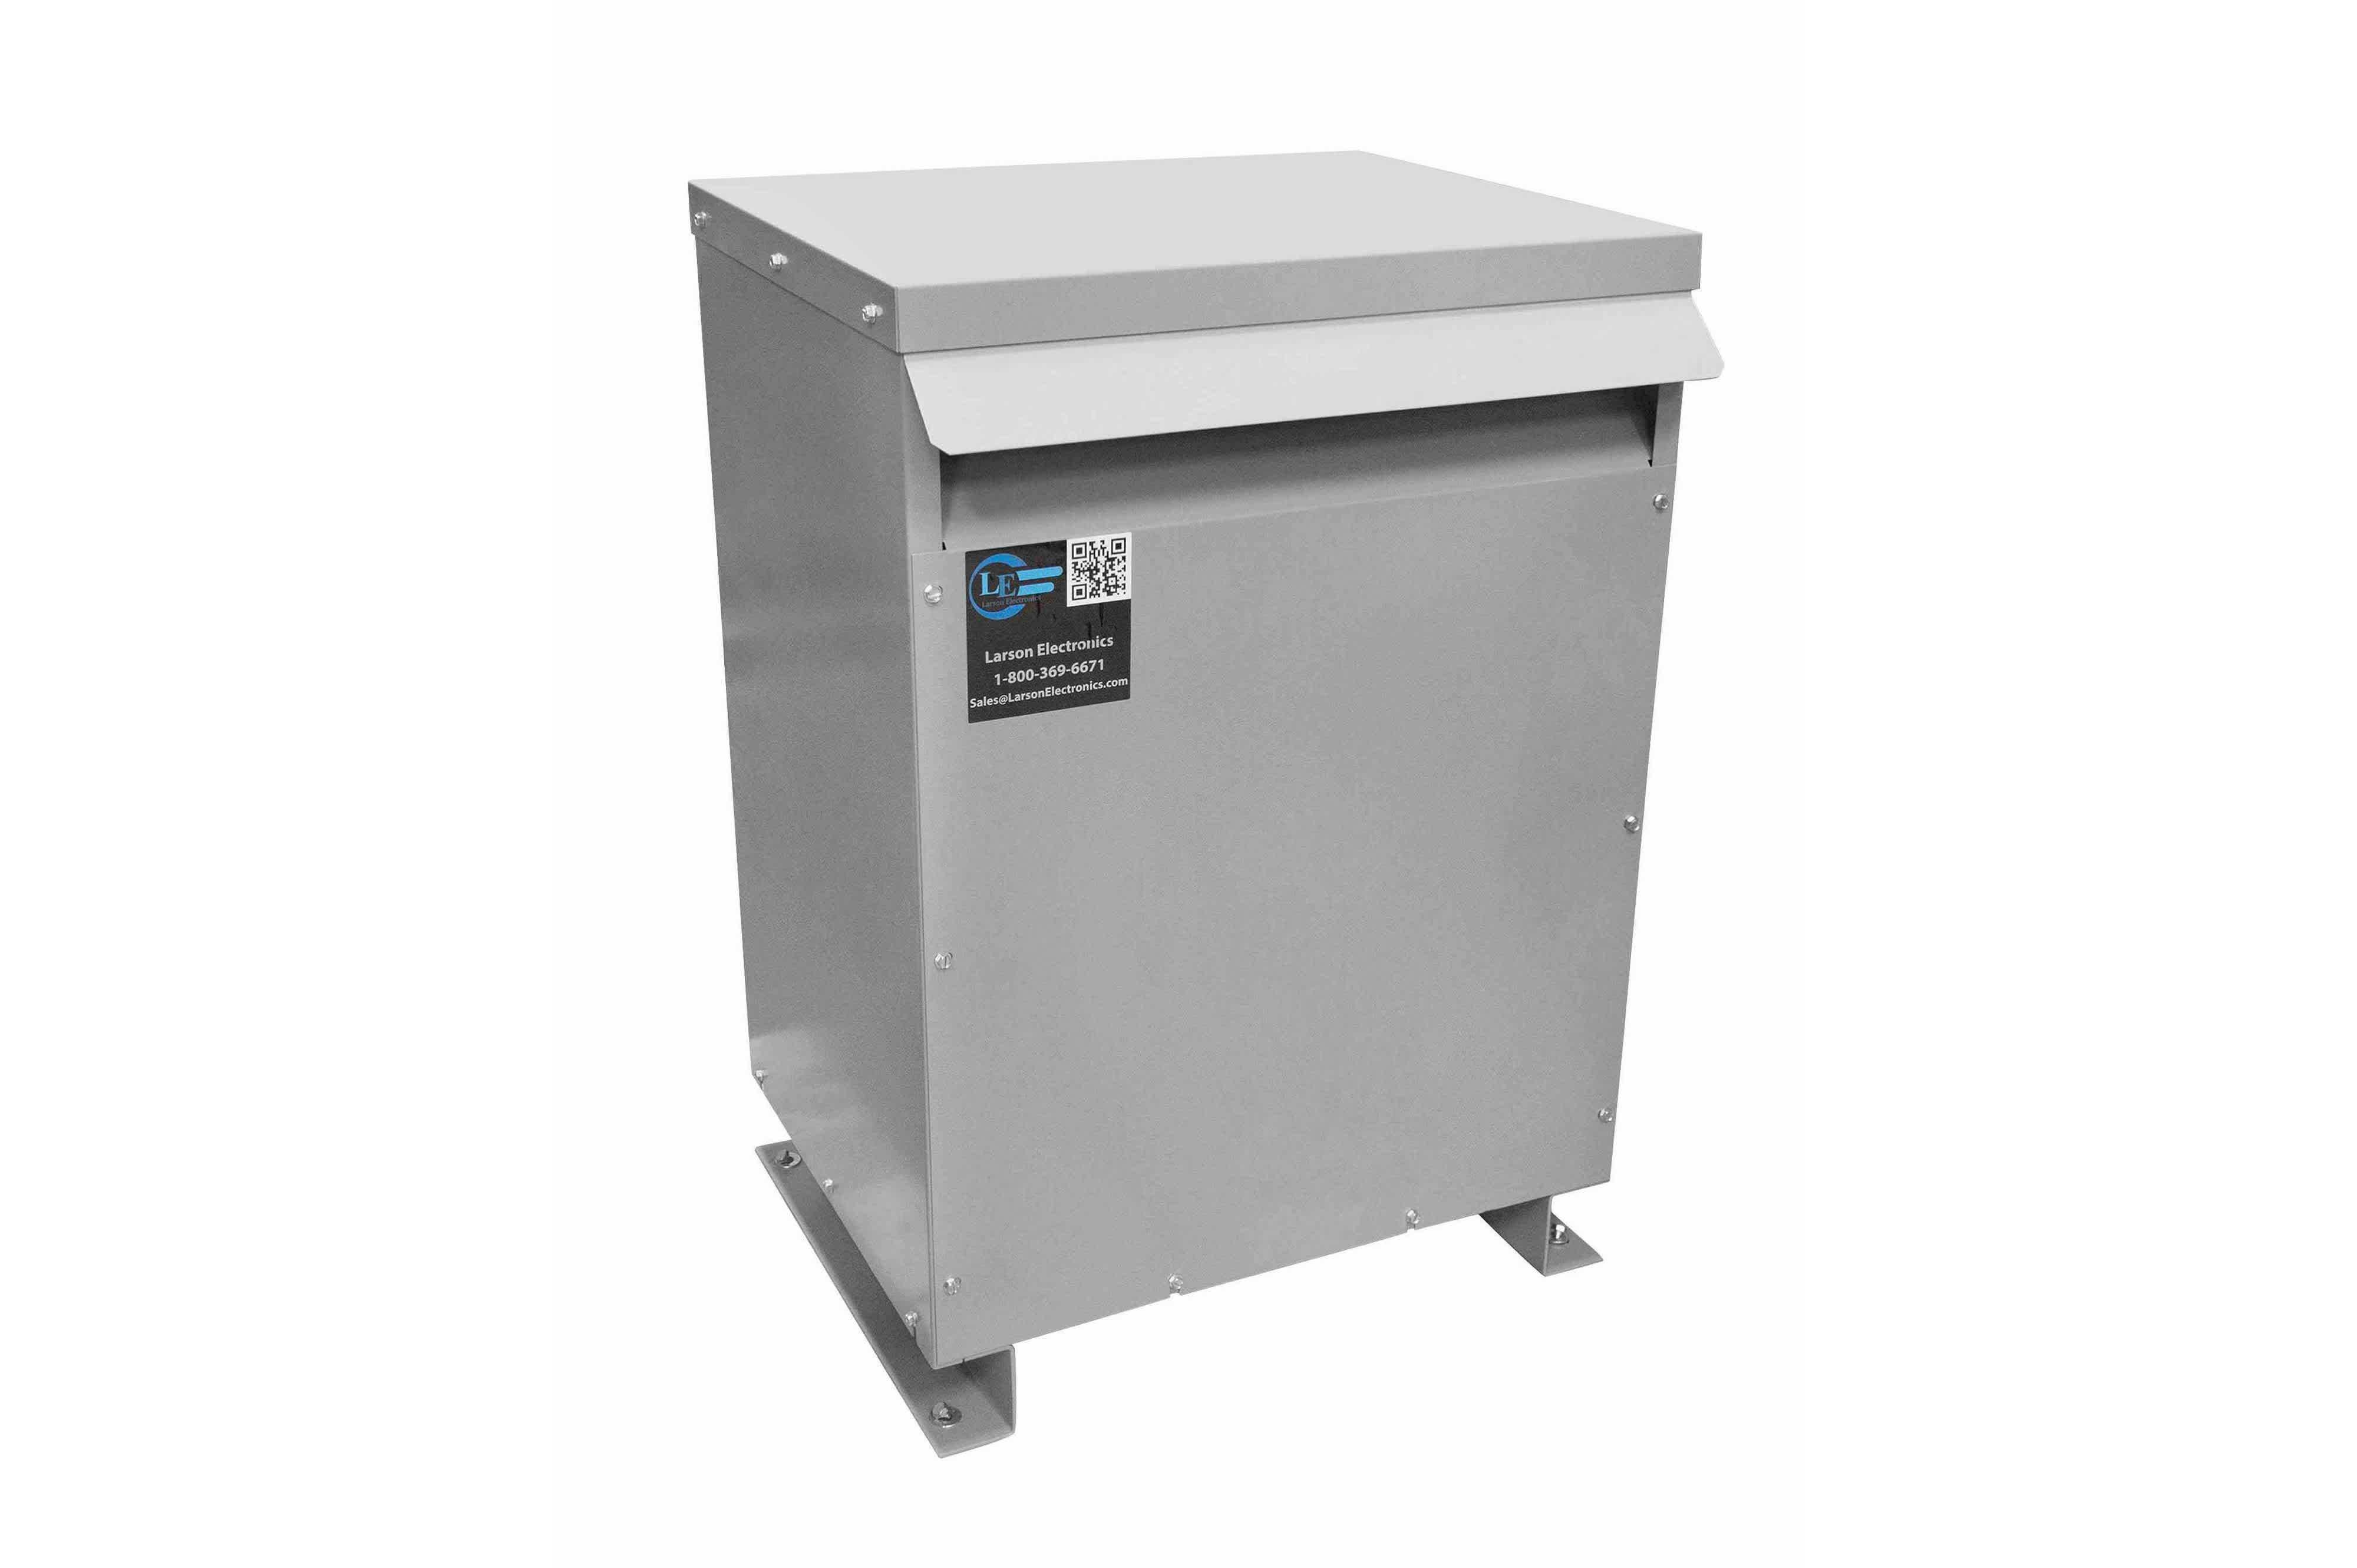 700 kVA 3PH Isolation Transformer, 208V Wye Primary, 600Y/347 Wye-N Secondary, N3R, Ventilated, 60 Hz